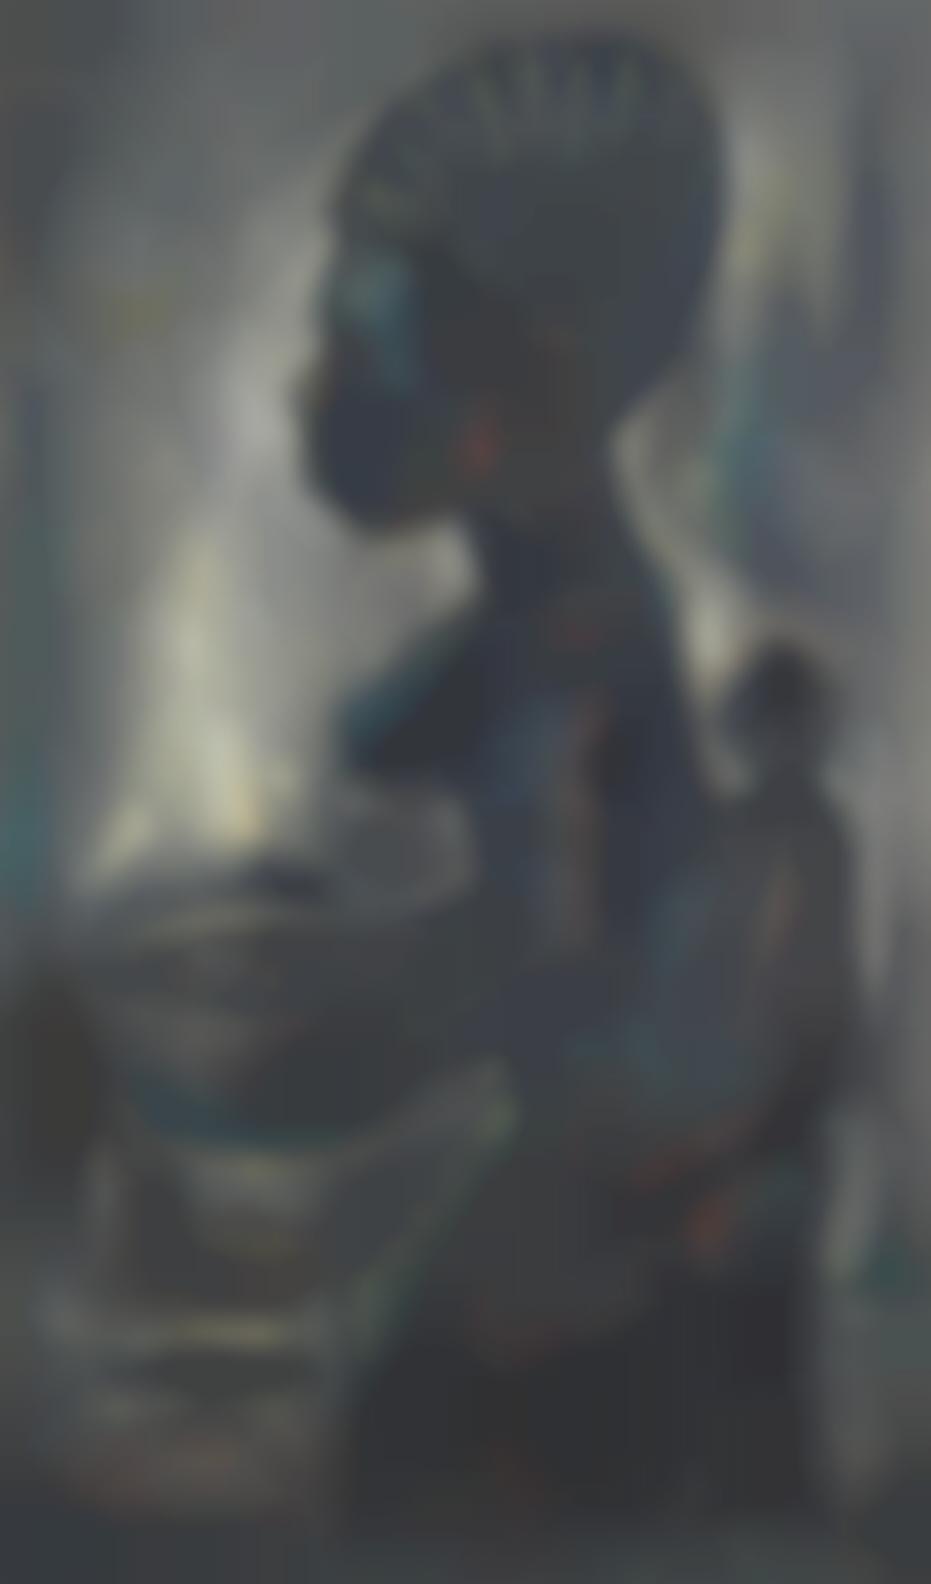 Kolade Oshinowo - Offering-2009